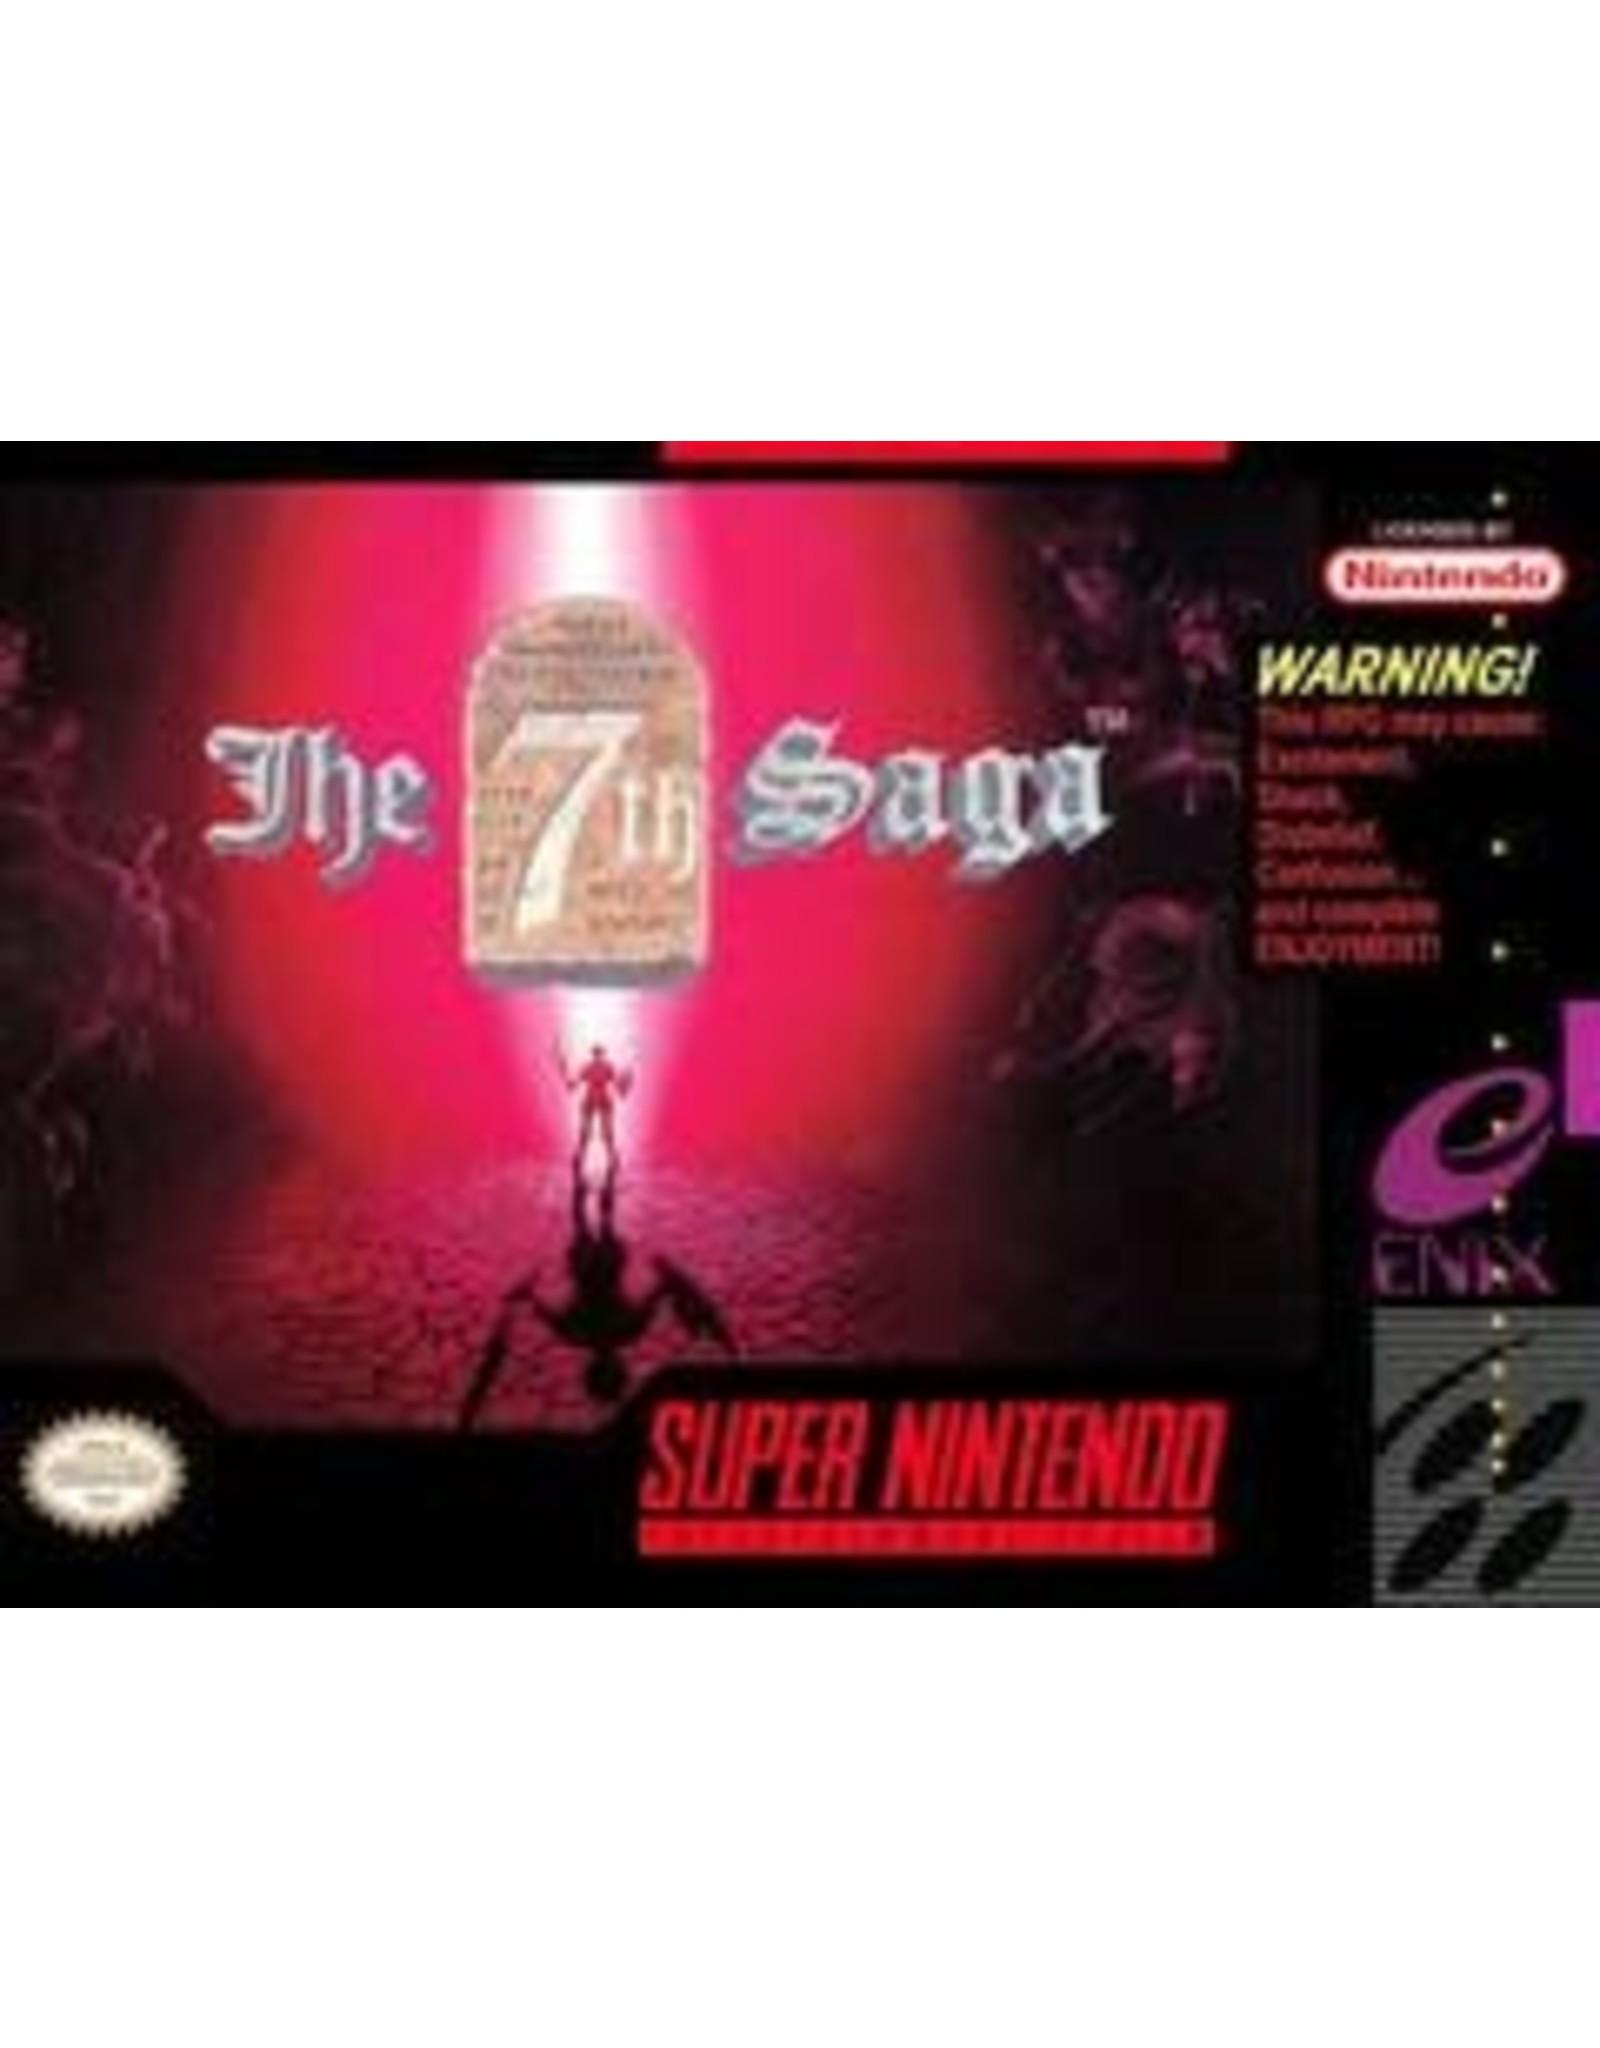 Super Nintendo 7th Saga (Cart Only)